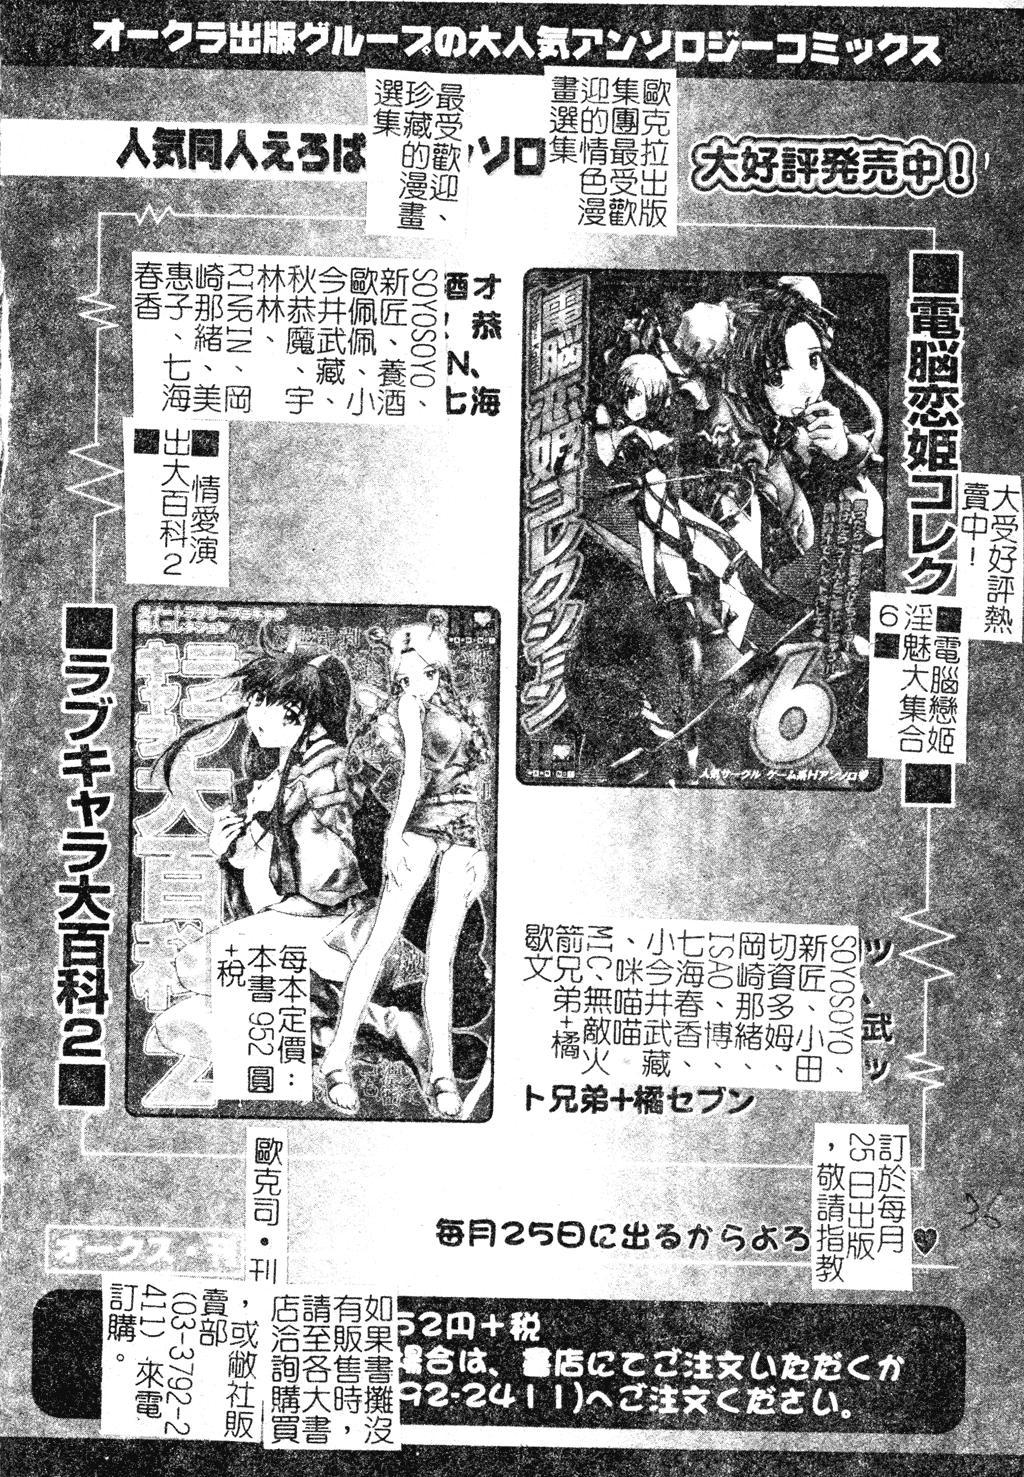 DenNow Koihime Collection 7 28